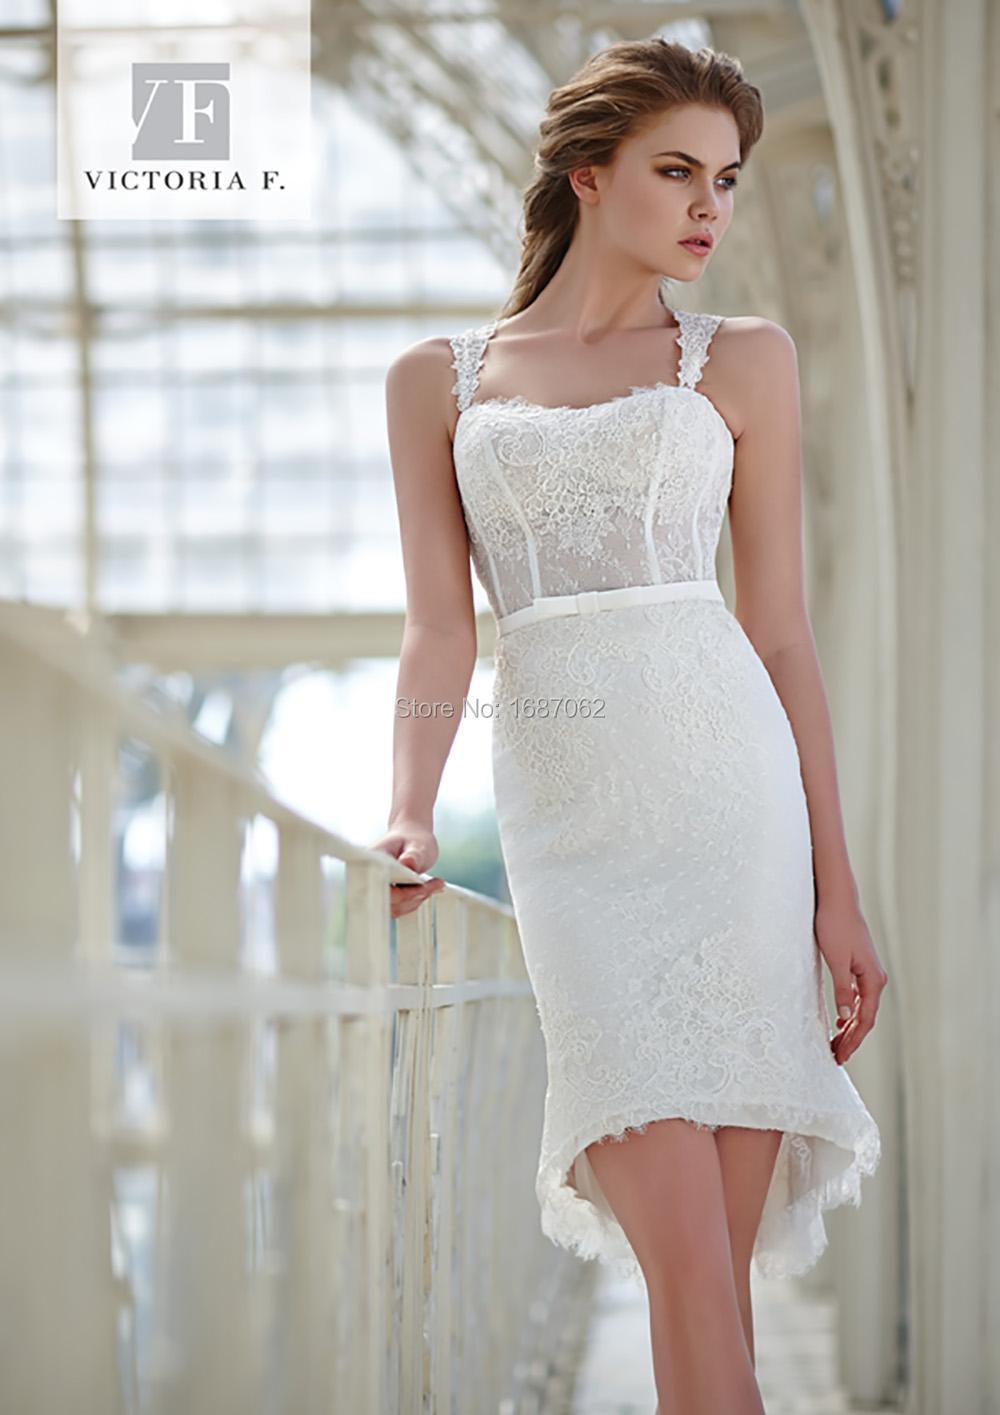 white dresses beach wedding short beach wedding dress White Dresses Beach Wedding 26